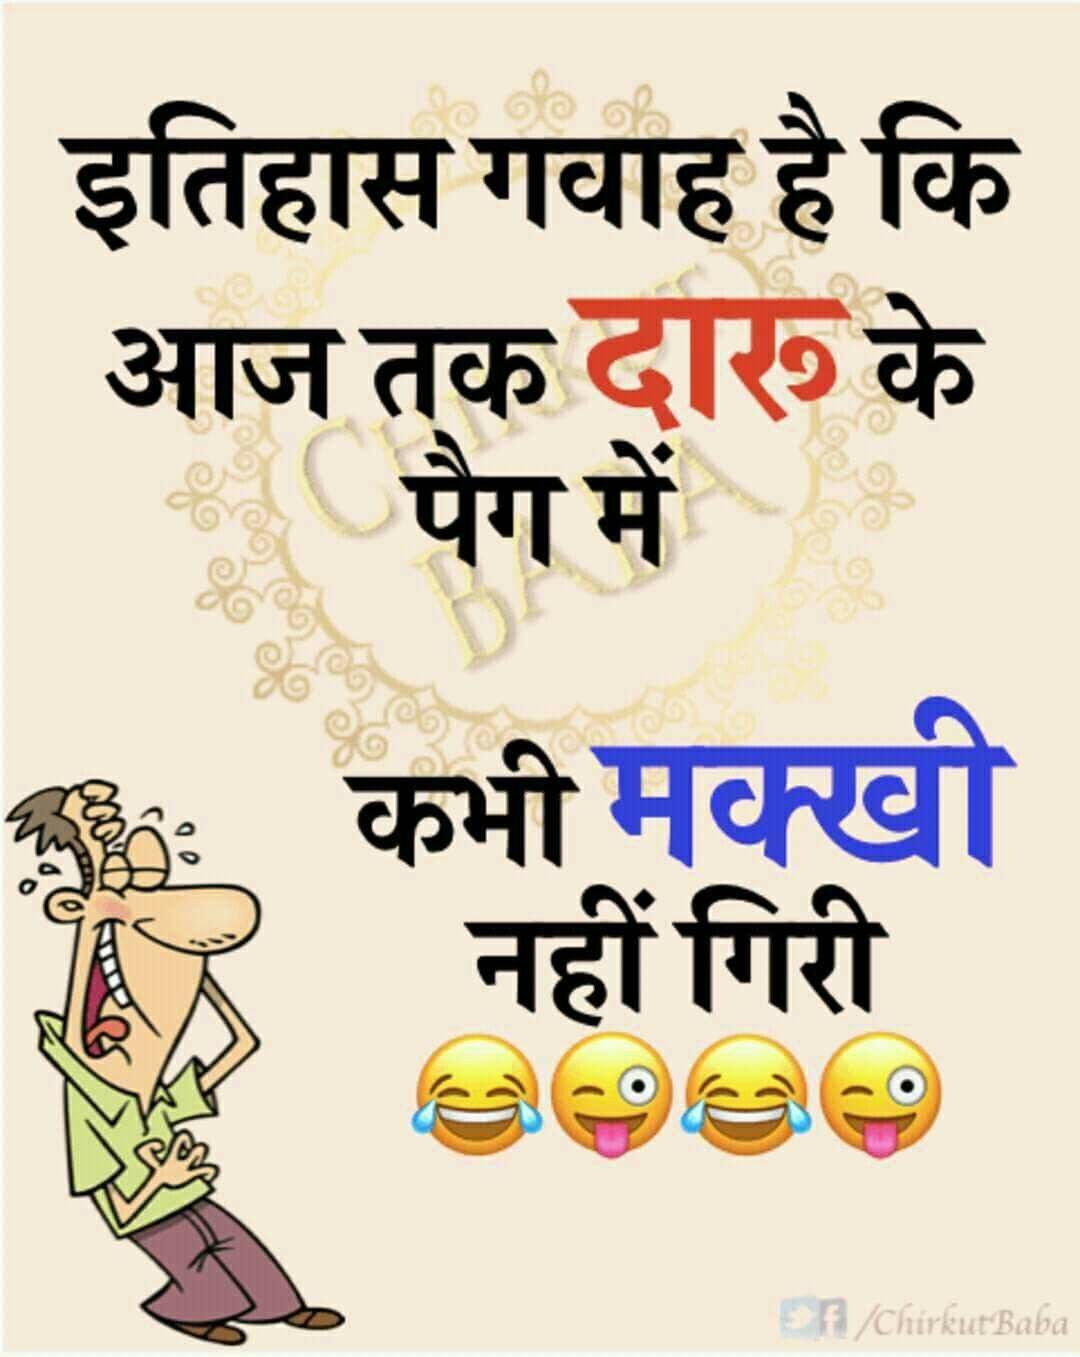 Sanjana V Singh Funny insults